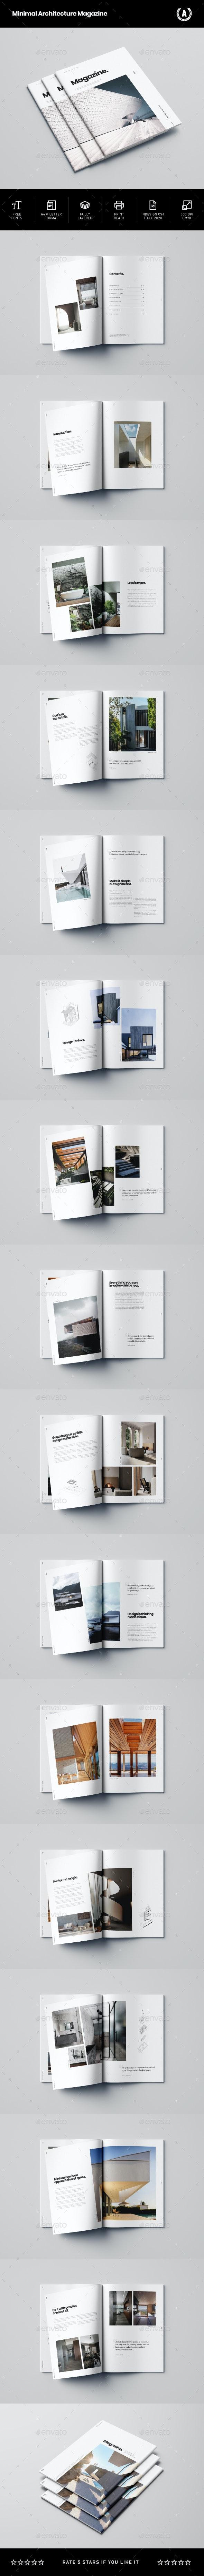 Minimal Architecture Magazine - Magazines Print Templates